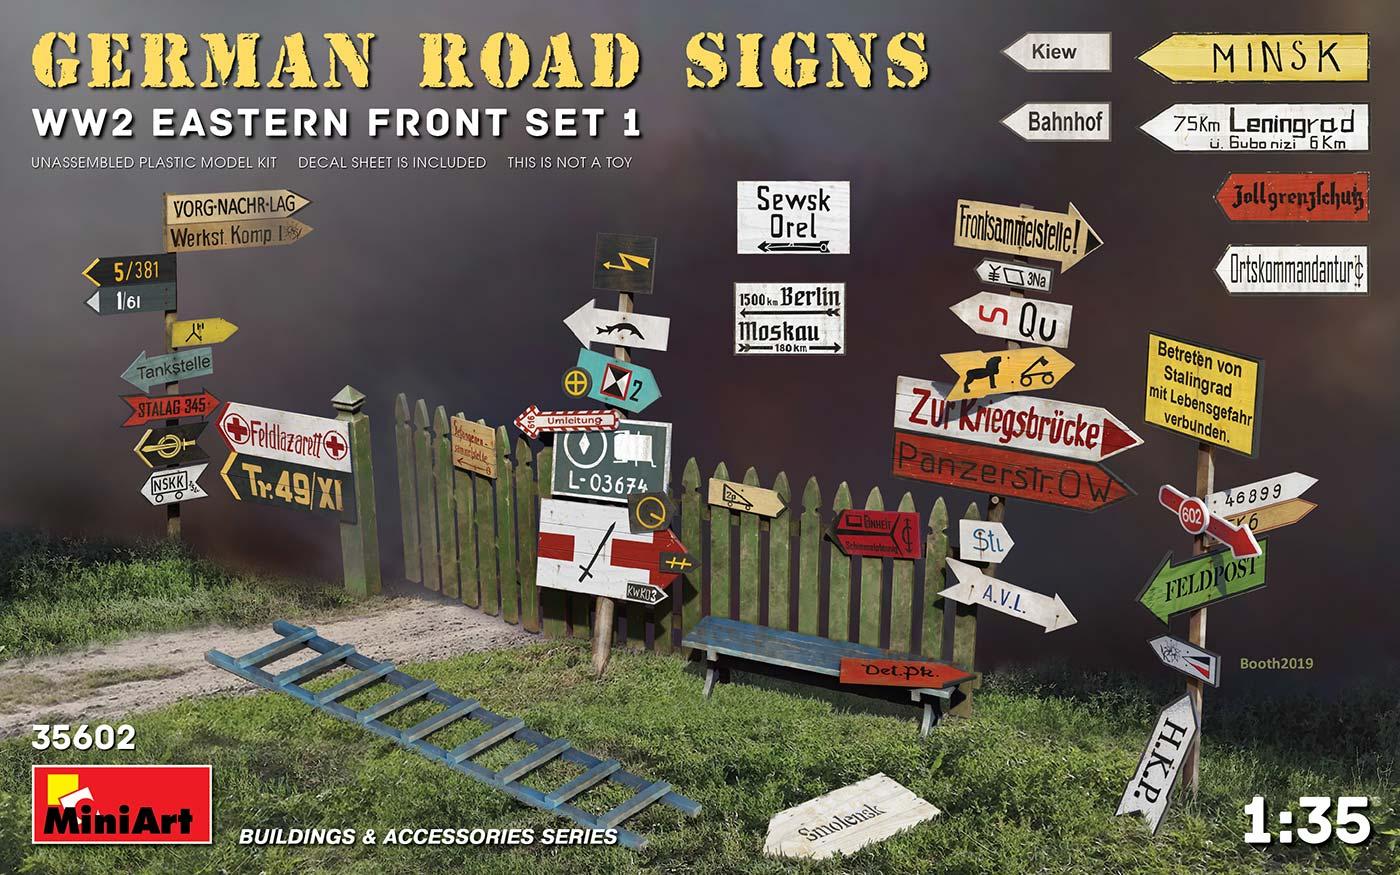 1/35 GERMAN ROAD SIGNS WW2 (EASTERN FRONT SET 1) 35602